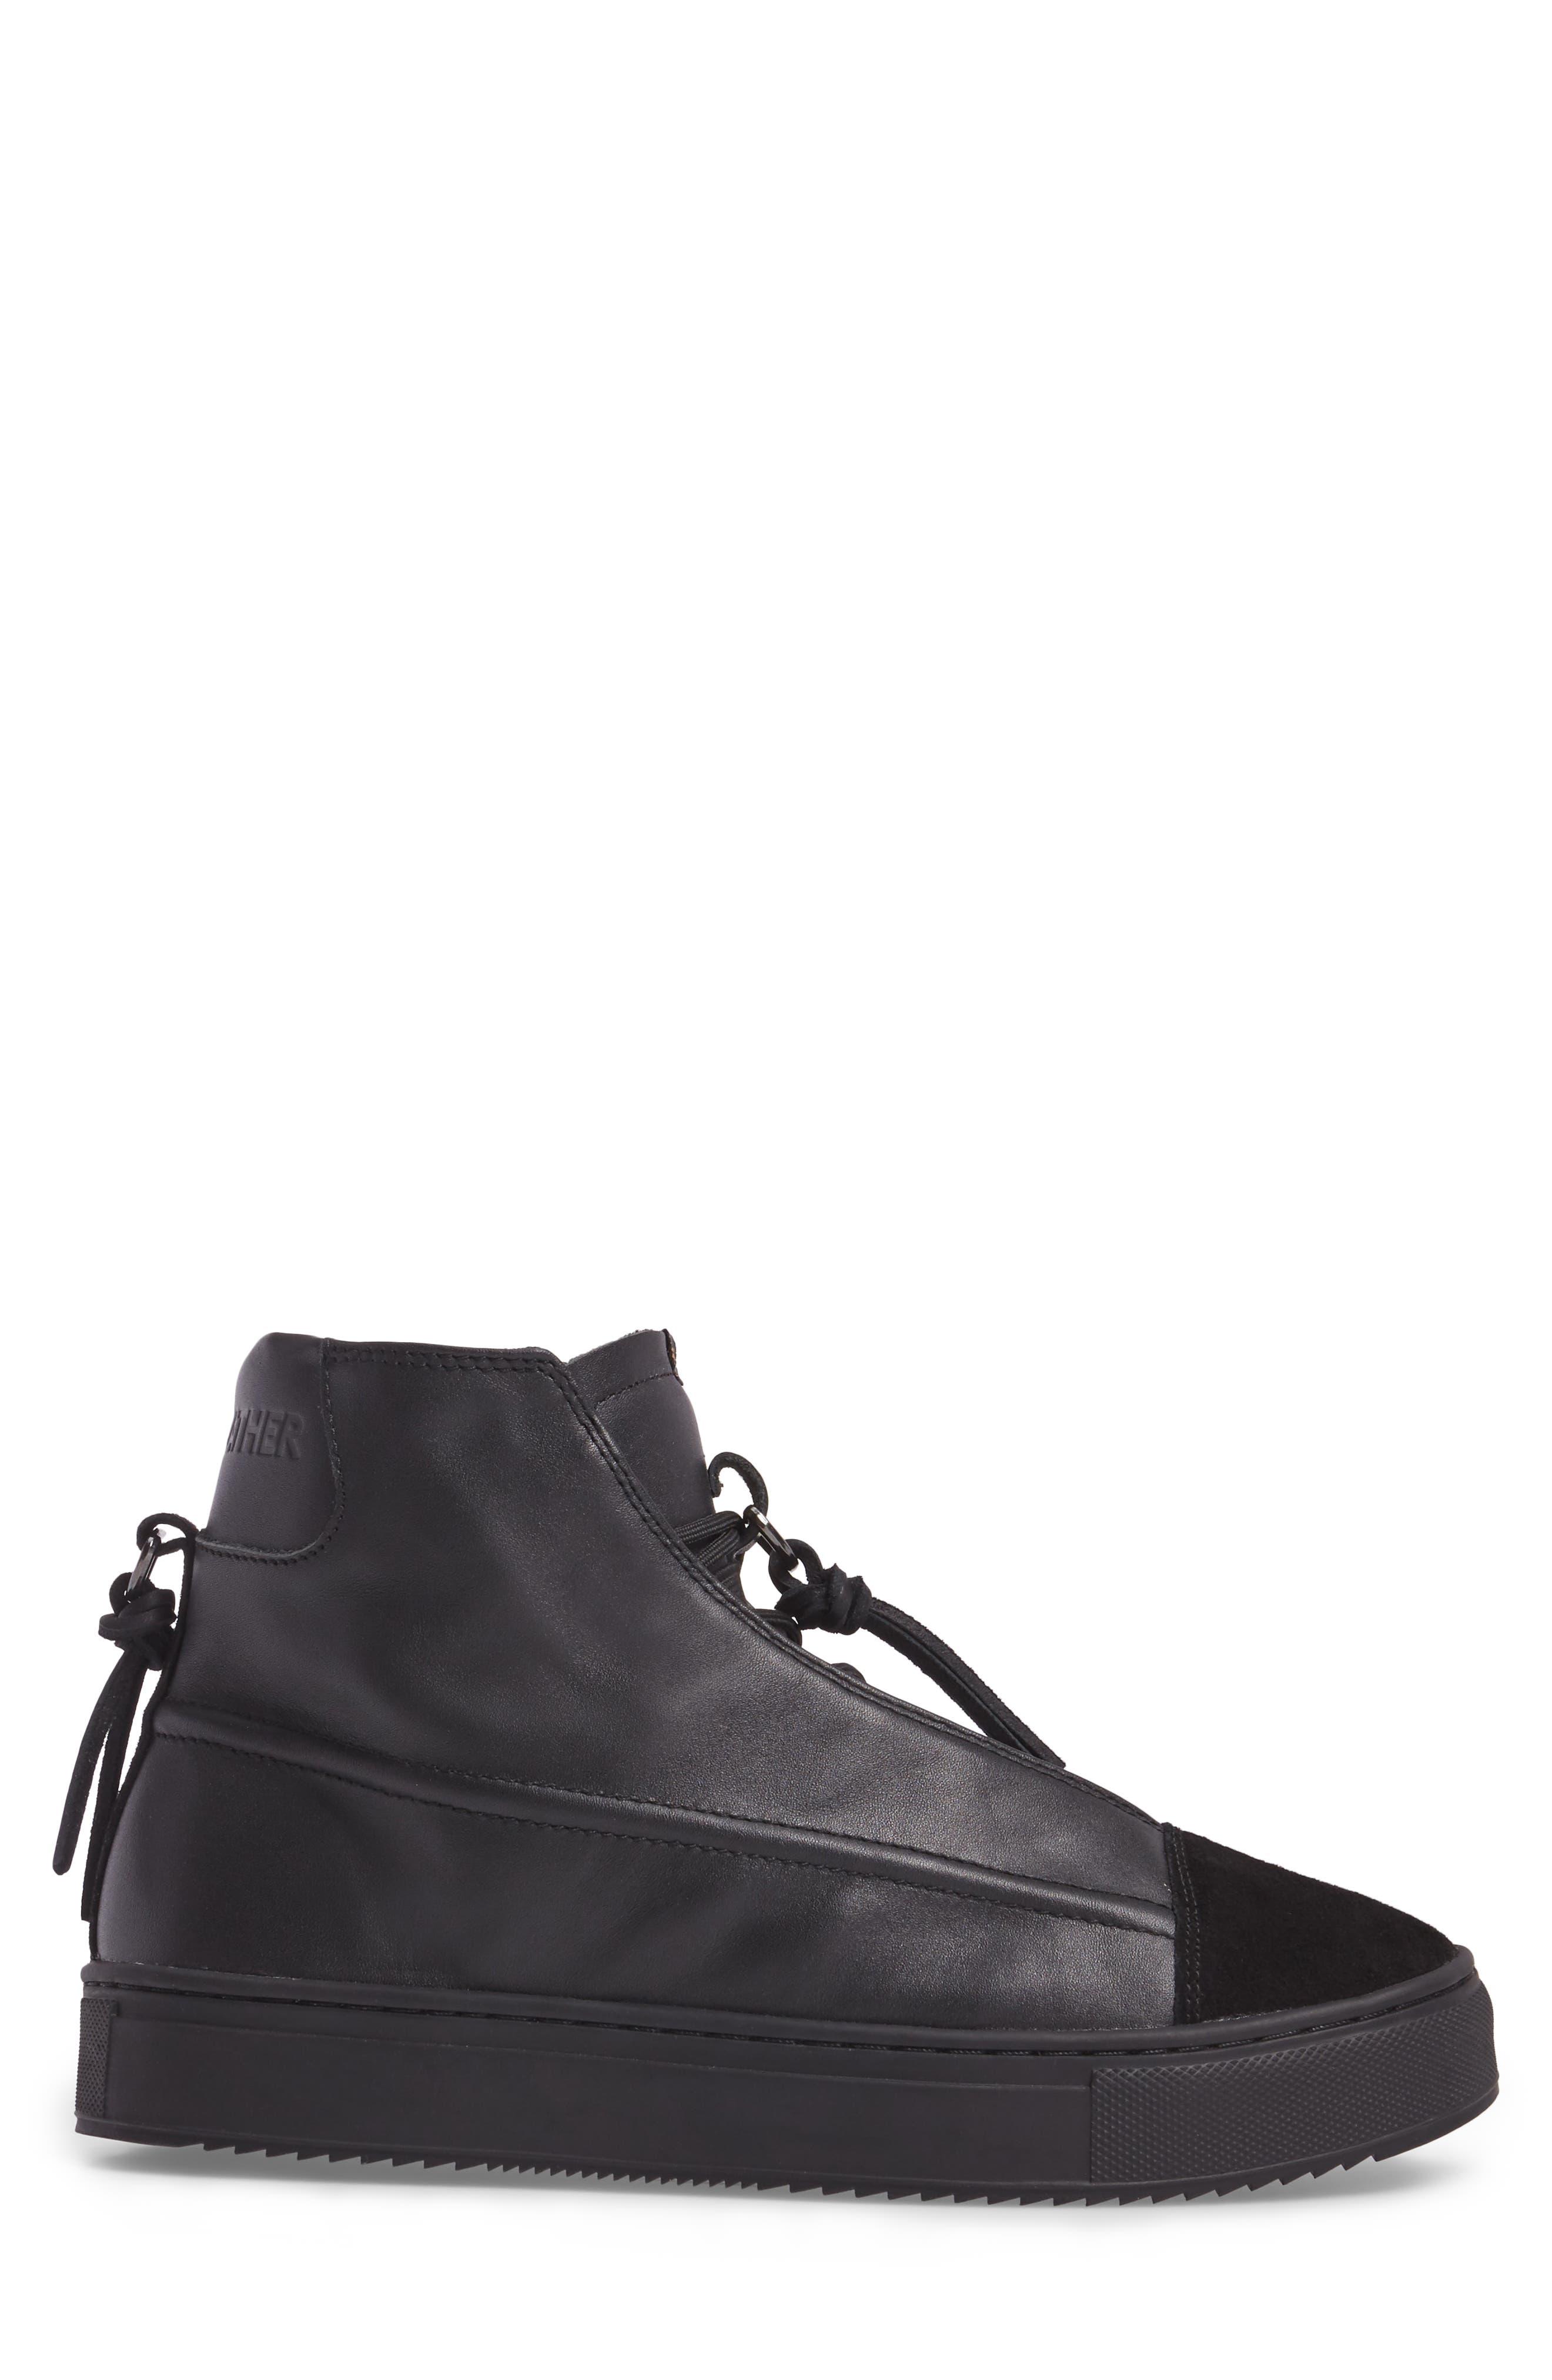 Sidney High Top Sneaker,                             Alternate thumbnail 3, color,                             Black